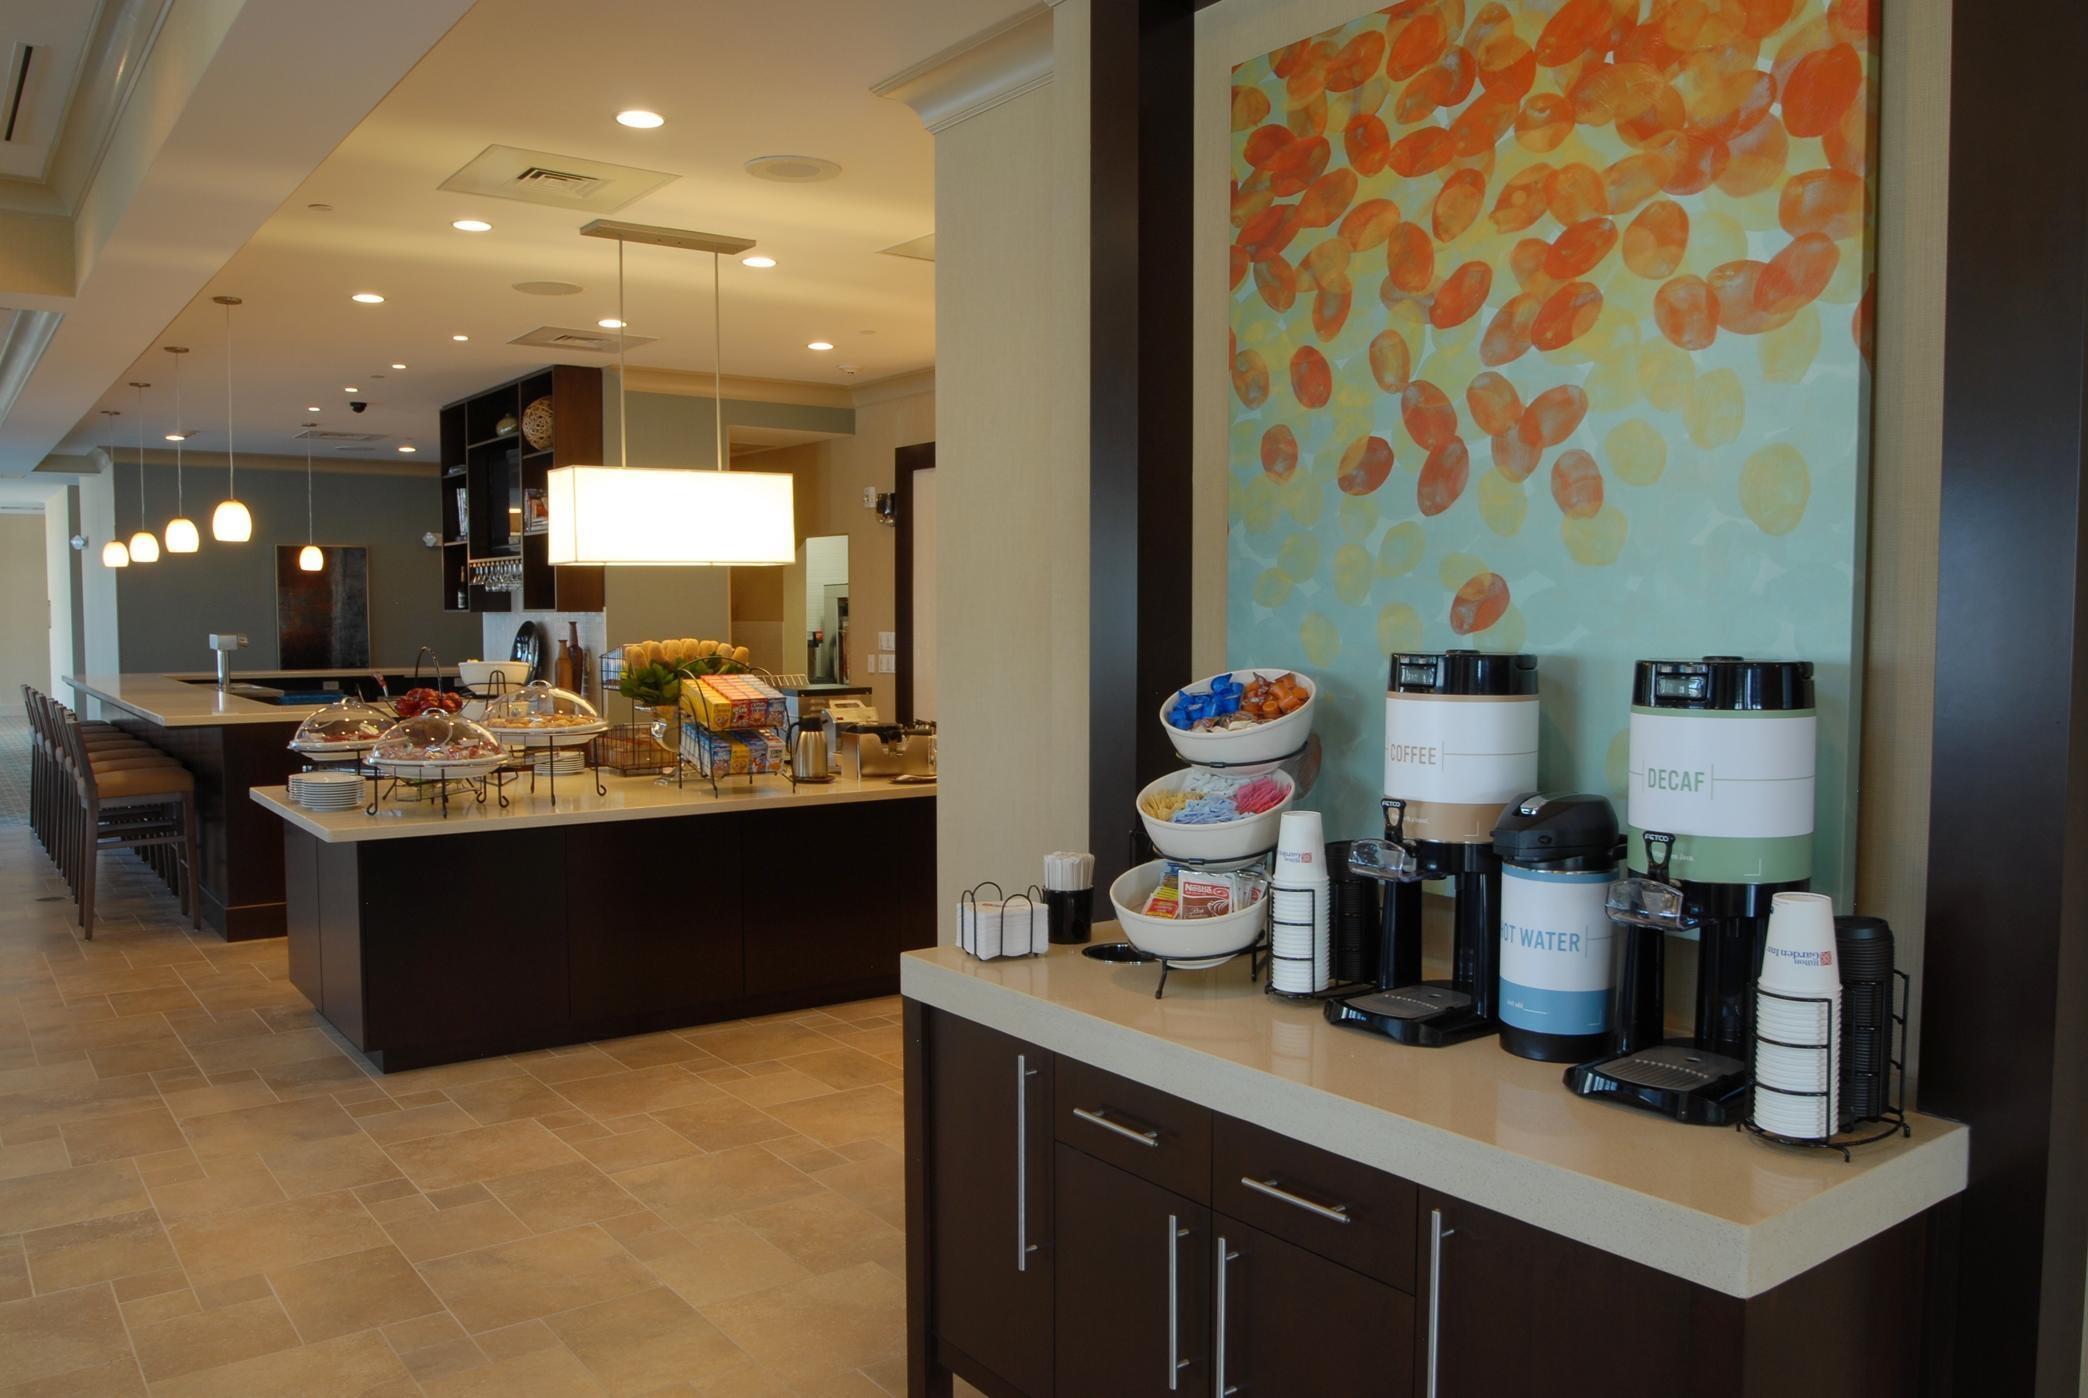 Hilton Garden Inn Charlotte/Concord image 5